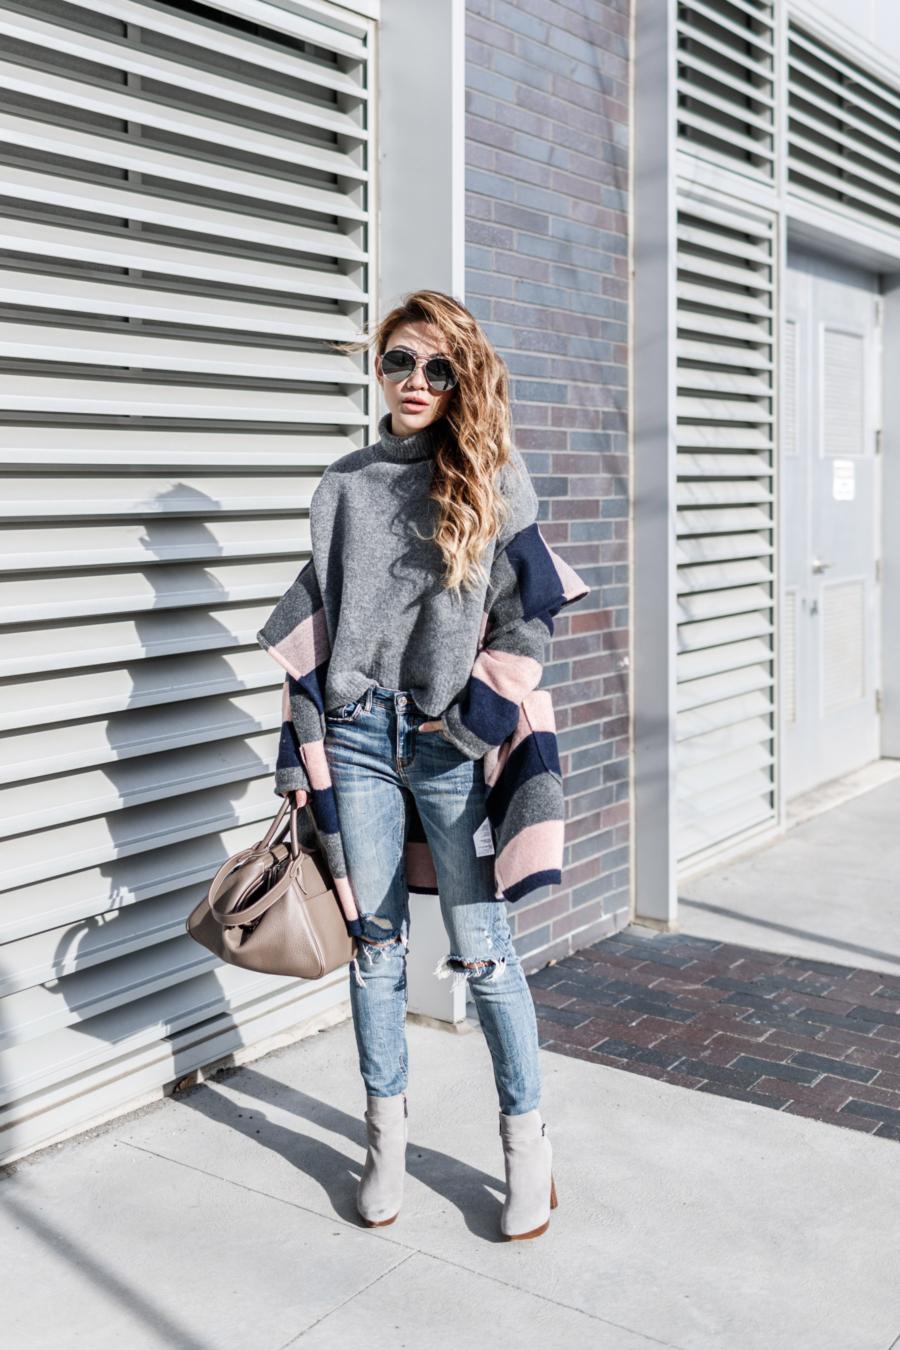 Blanket Coat Winter Outfits // NotJessFashion.com